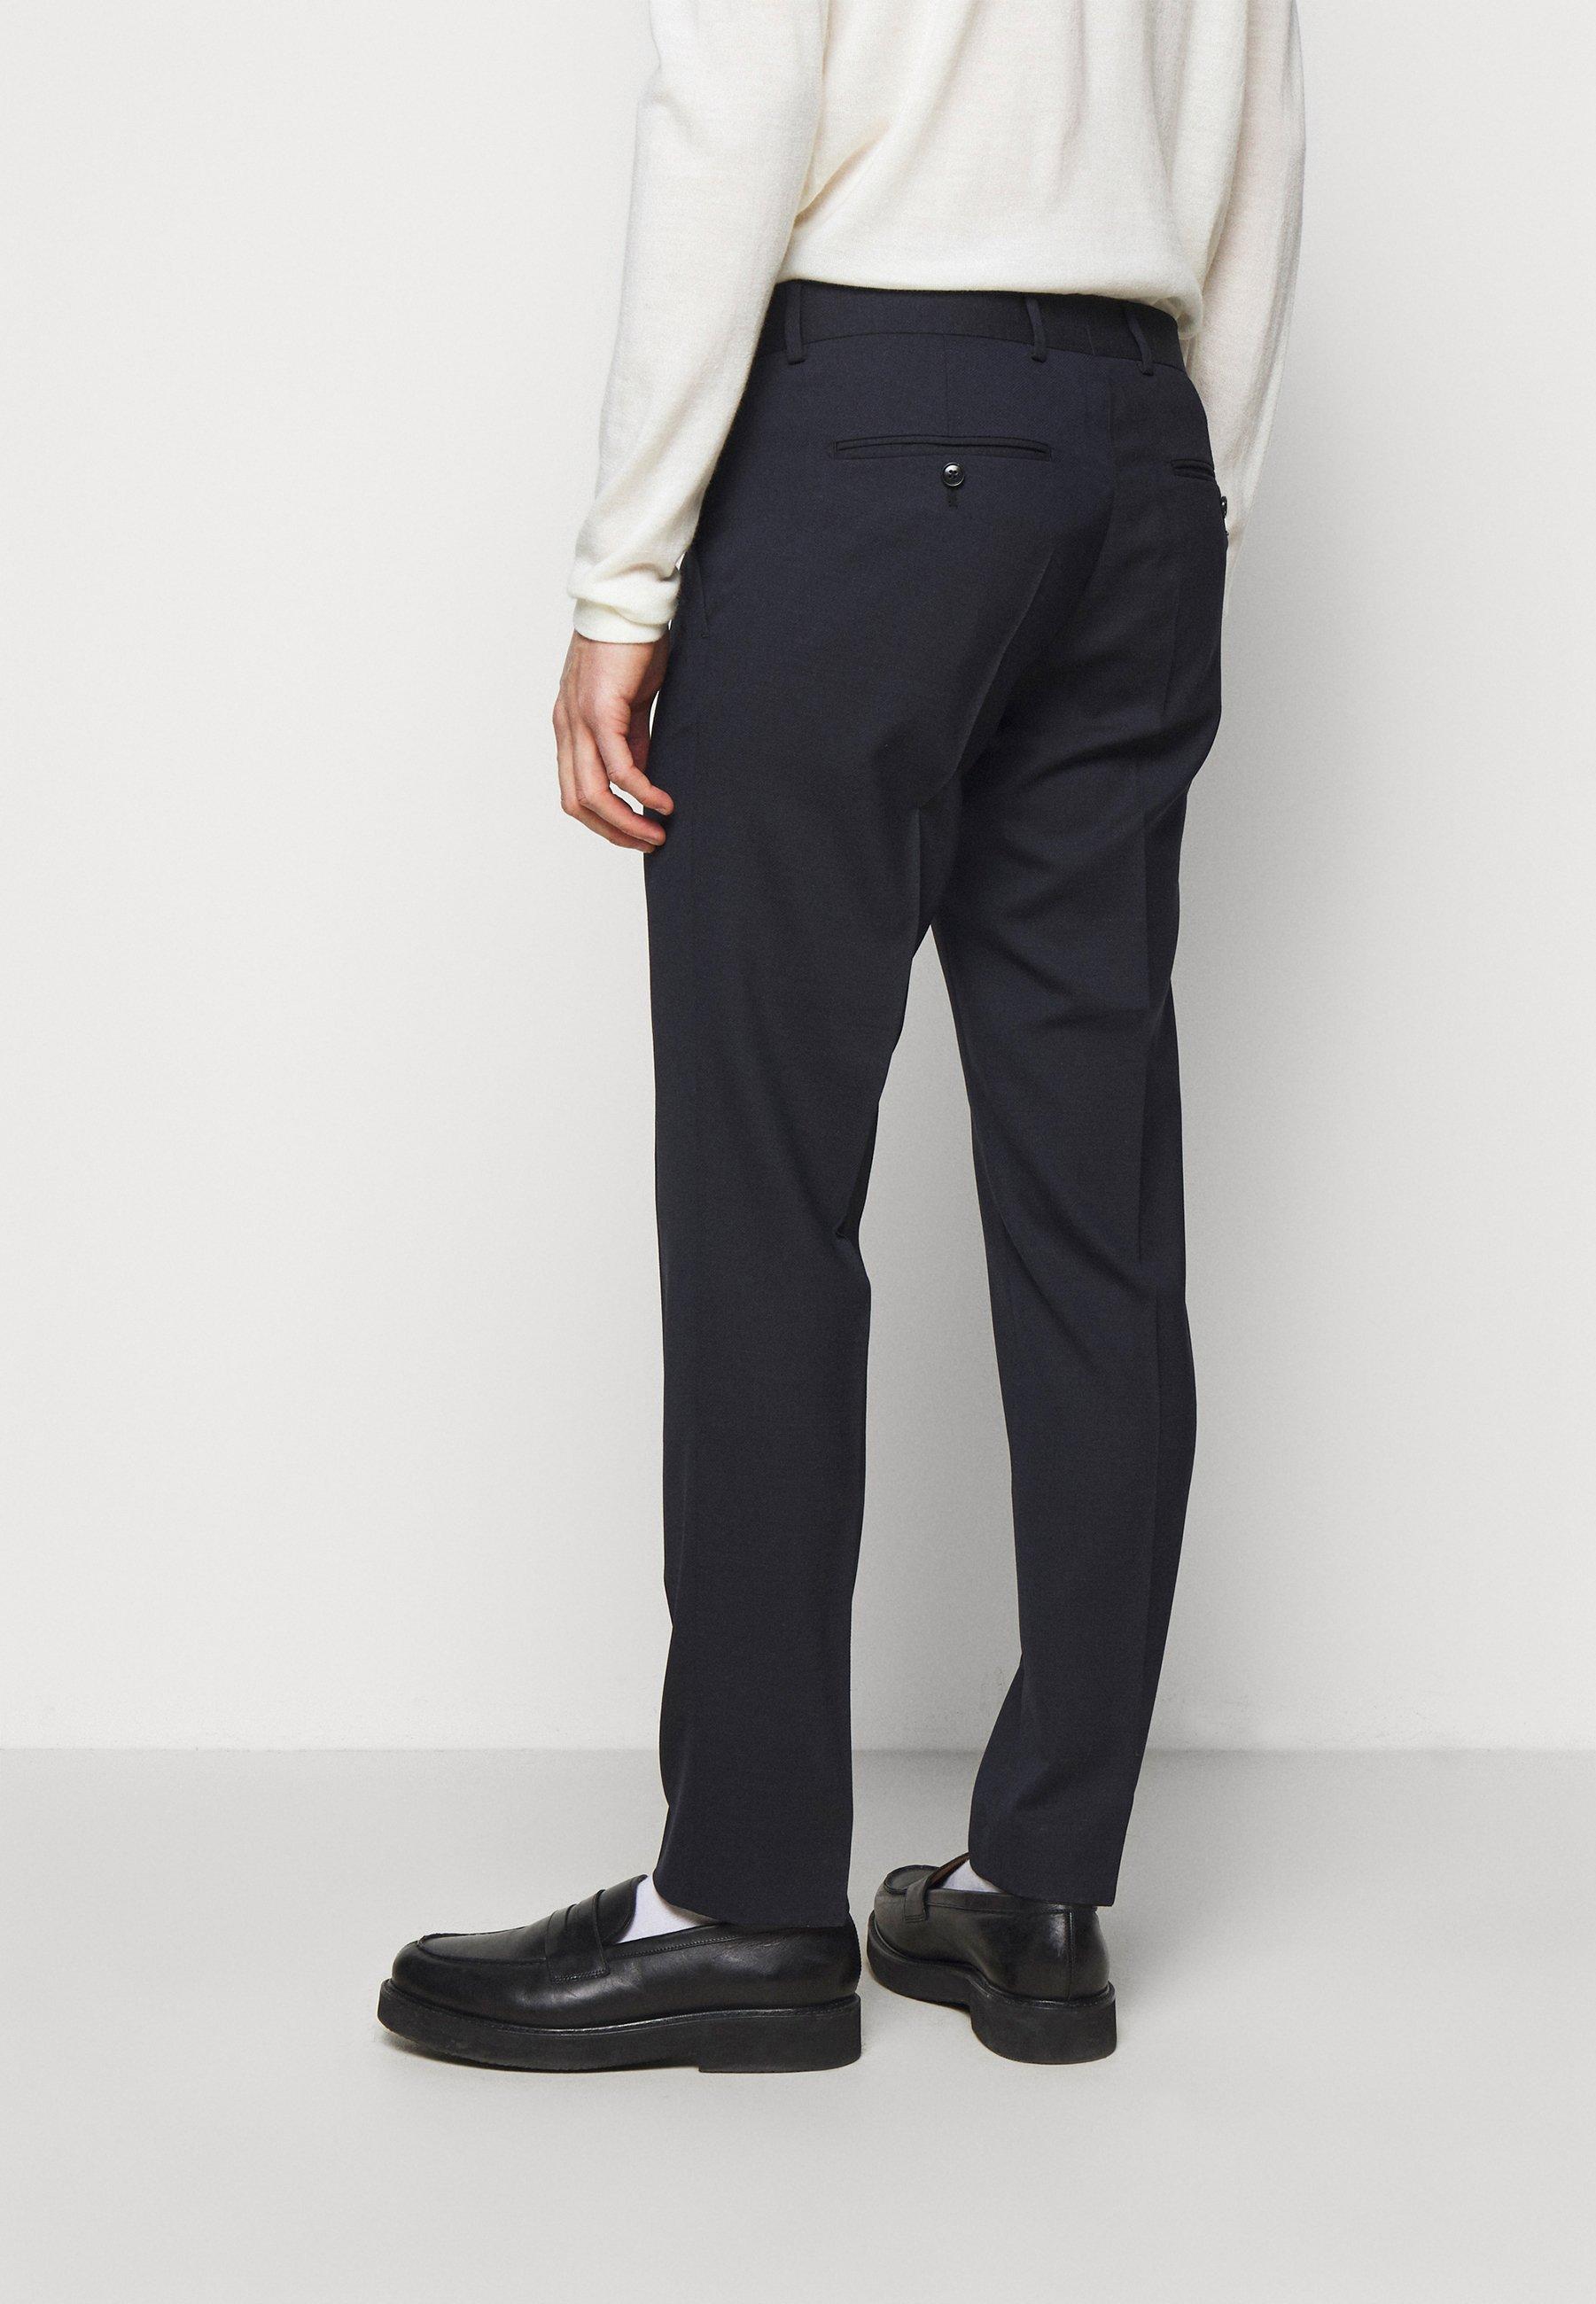 Homme JILE - Costume